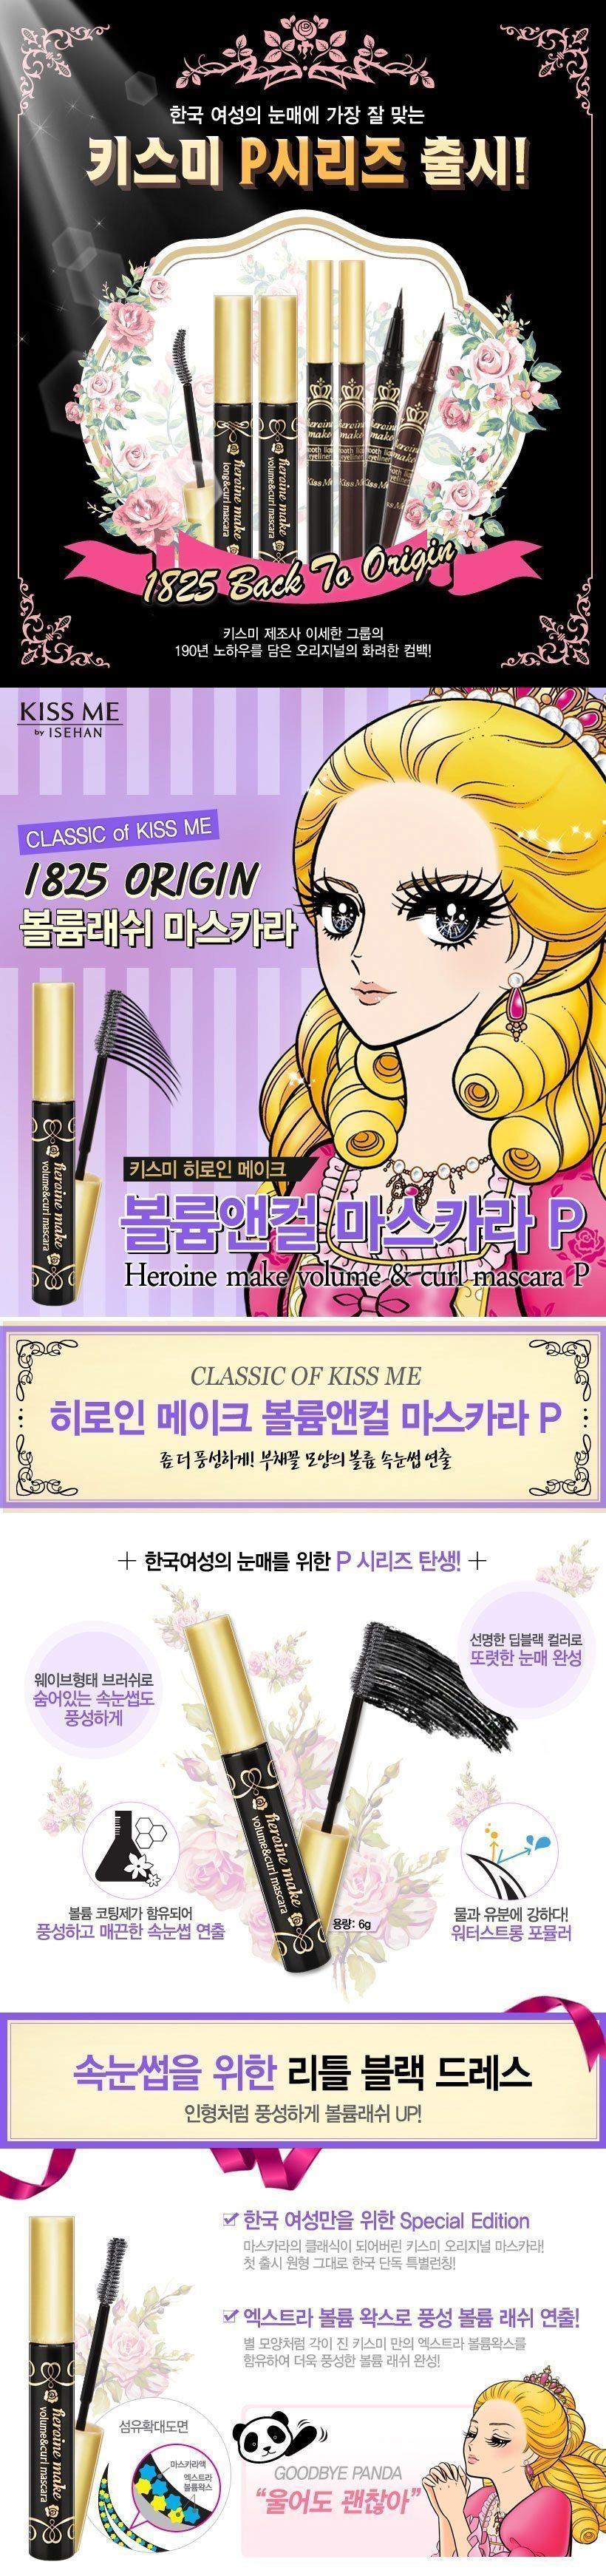 Aritaum Kiss Me Heroin Make Volume and Curl Mascara korean cosmetic makeup product online shop malaysia india taiwan1